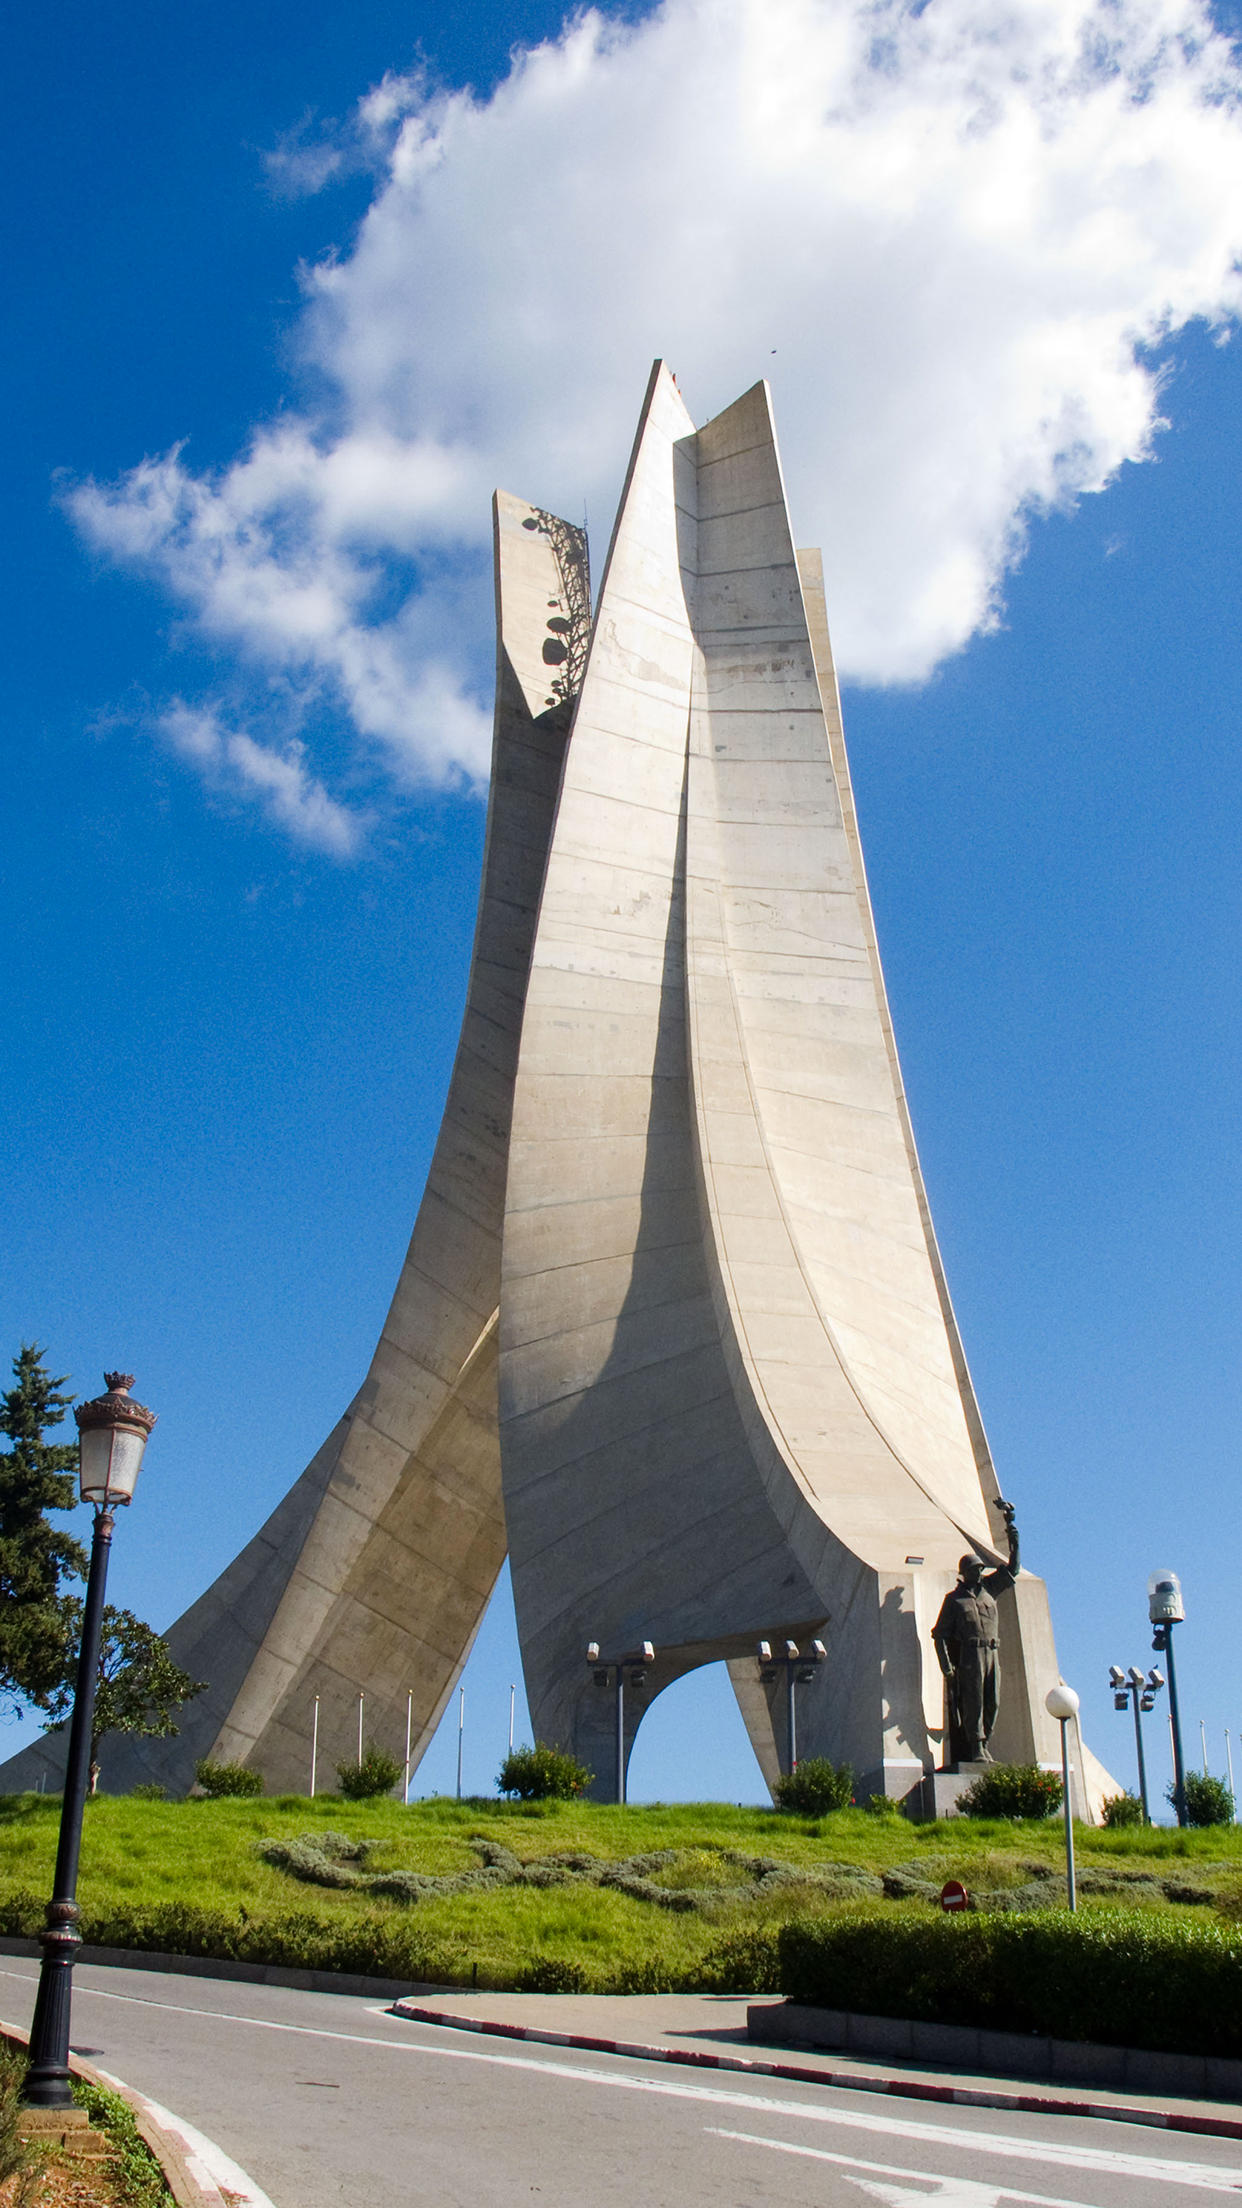 Fond D Écran Algerie alger memorial wallpaper for iphone x, 8, 7, 6 - free download on